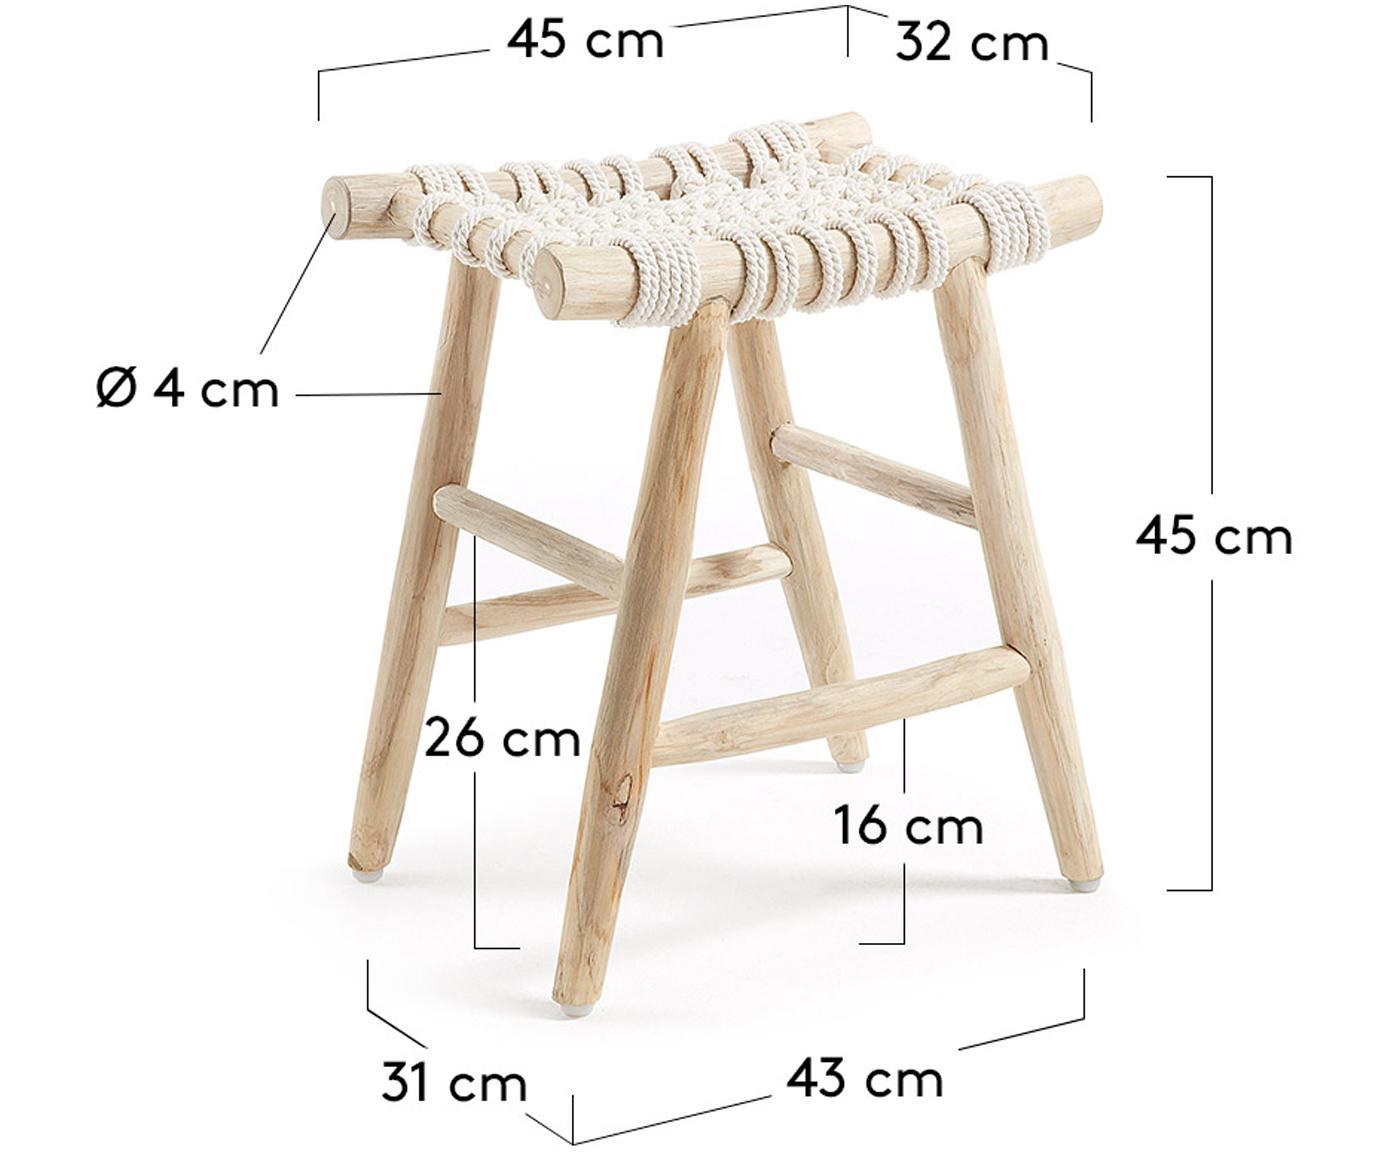 Hocker Edgard im Boho Style, Beine: Teakholz, naturbelassen, Sitzfläche: Baumwollseilgurt, Teakholz, Weiß, 45 x 45 cm